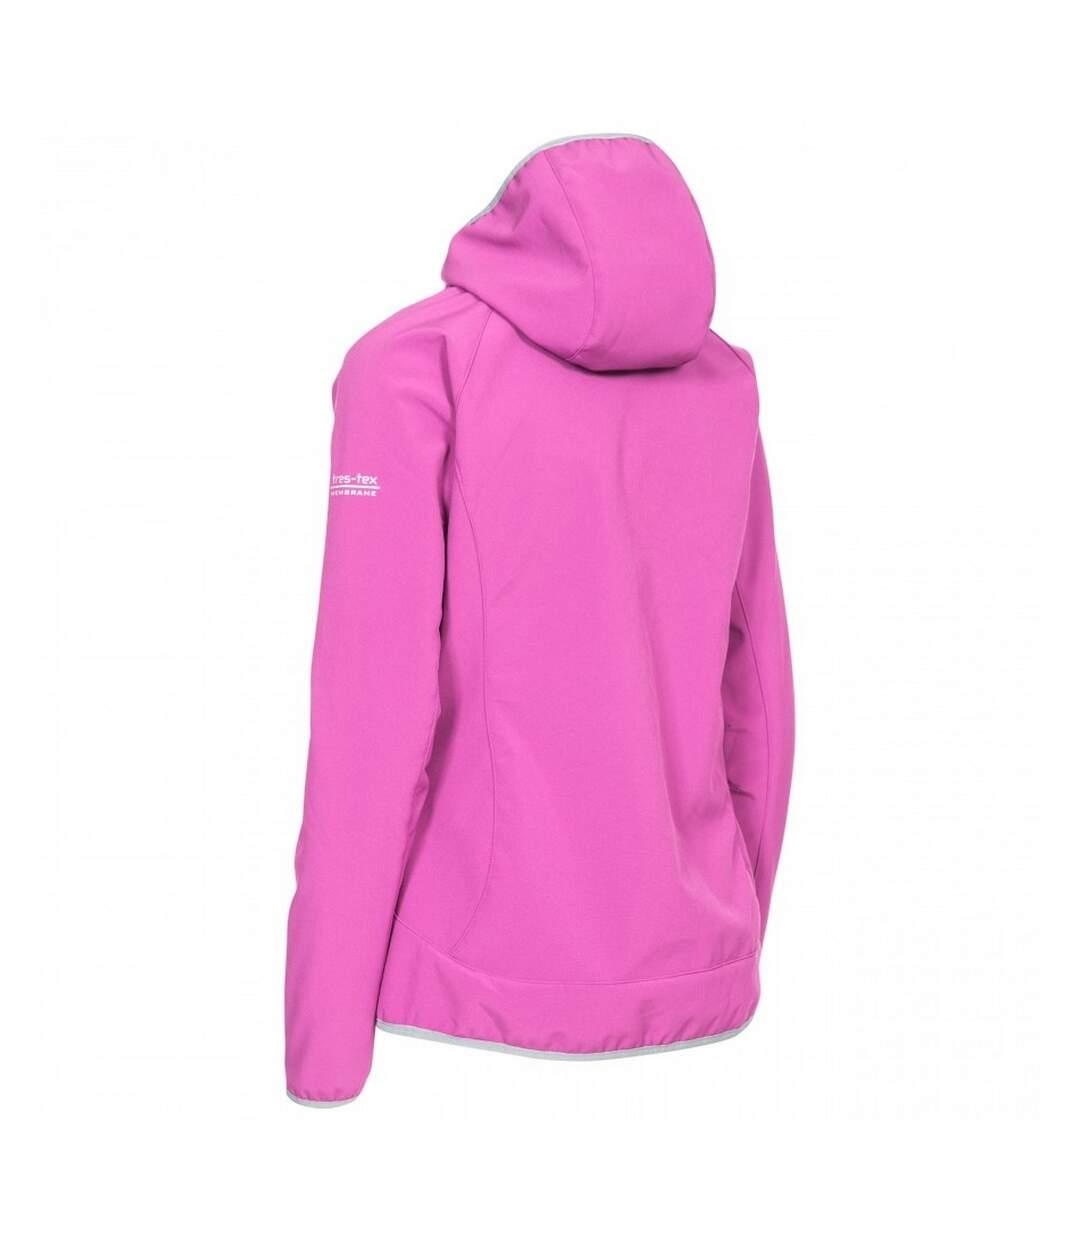 Trespass Womens/Ladies Imani Waterproof Softshell Jacket (Purple Orchid) - UTTP1278